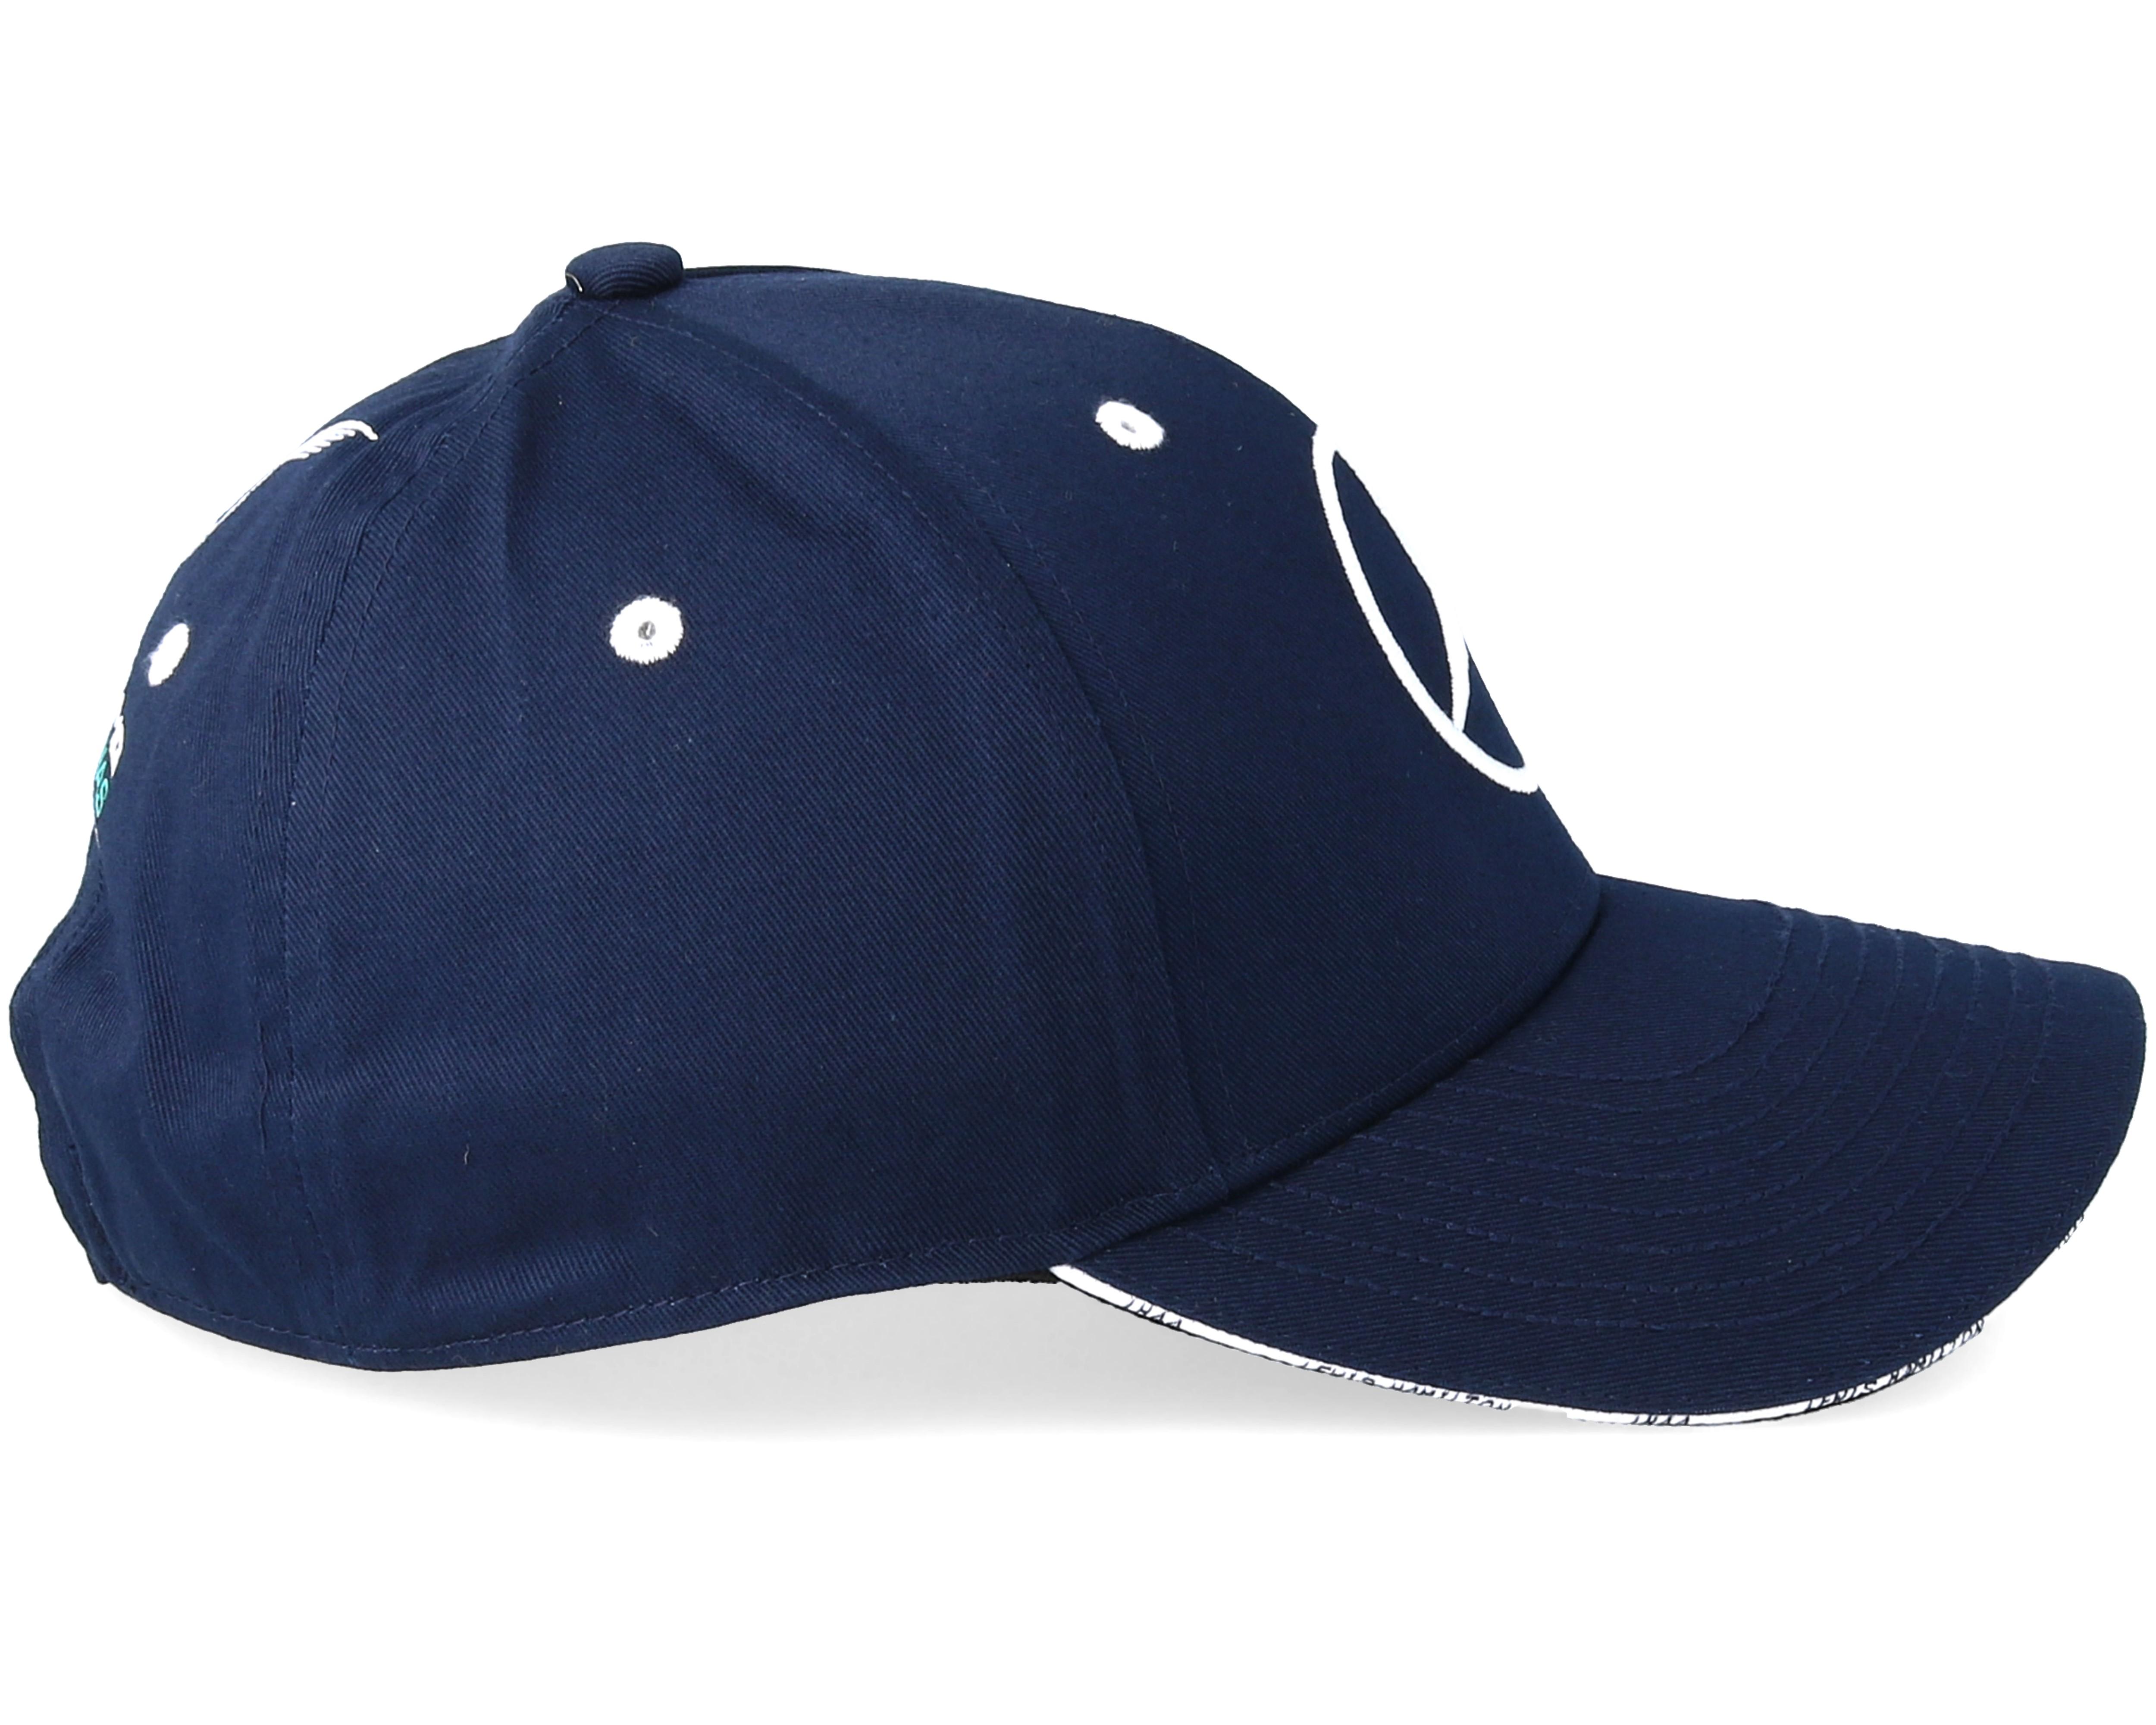 lewis hamilton silverstone cap navy adjustable mercedes casquette. Black Bedroom Furniture Sets. Home Design Ideas